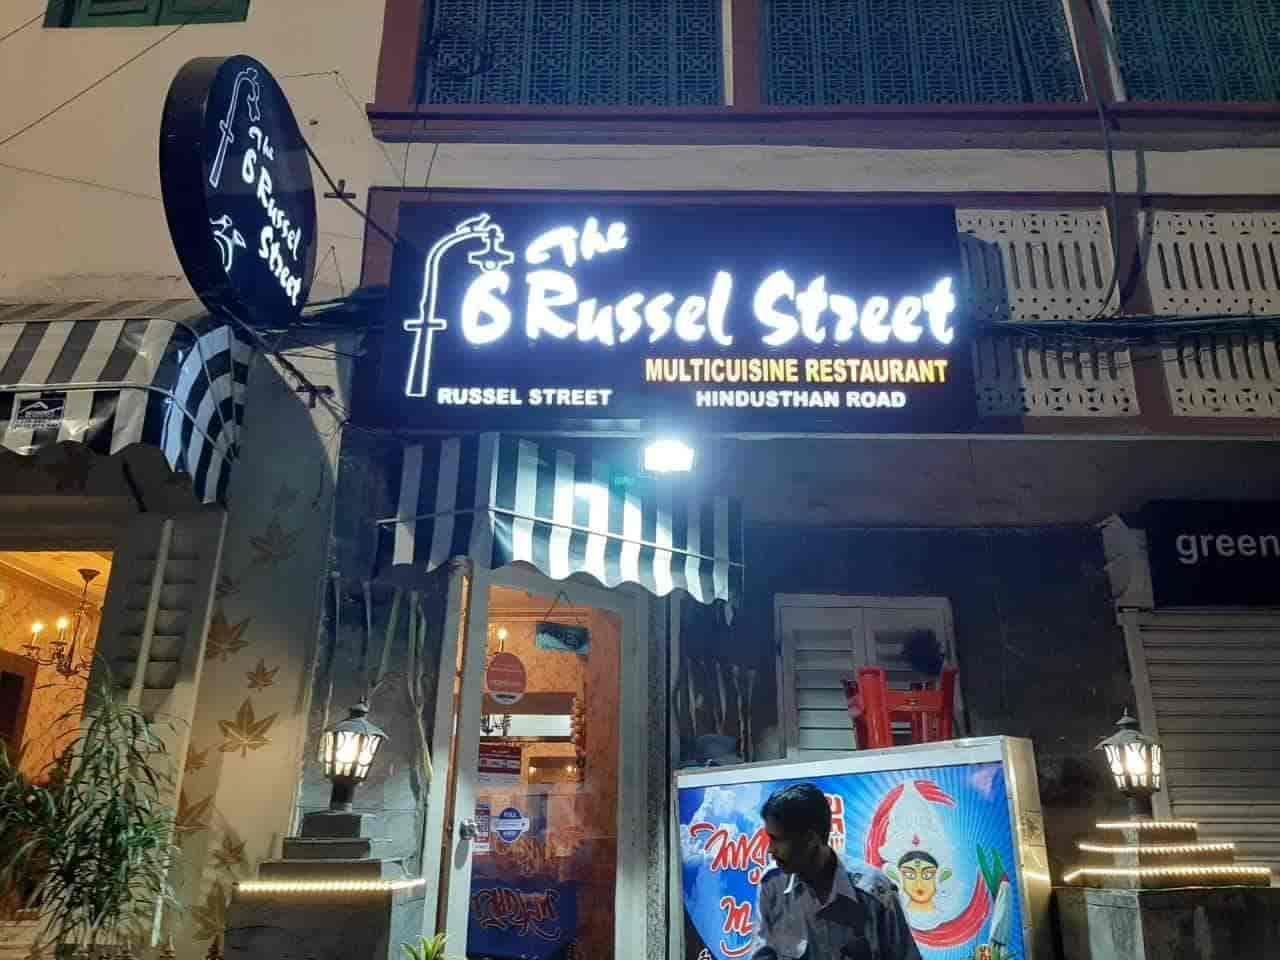 The 6 Russell Street, Midleton Row, Kolkata - Rolls, Chinese, Fast Food, Street Food Cuisine Restaurant - Justdial